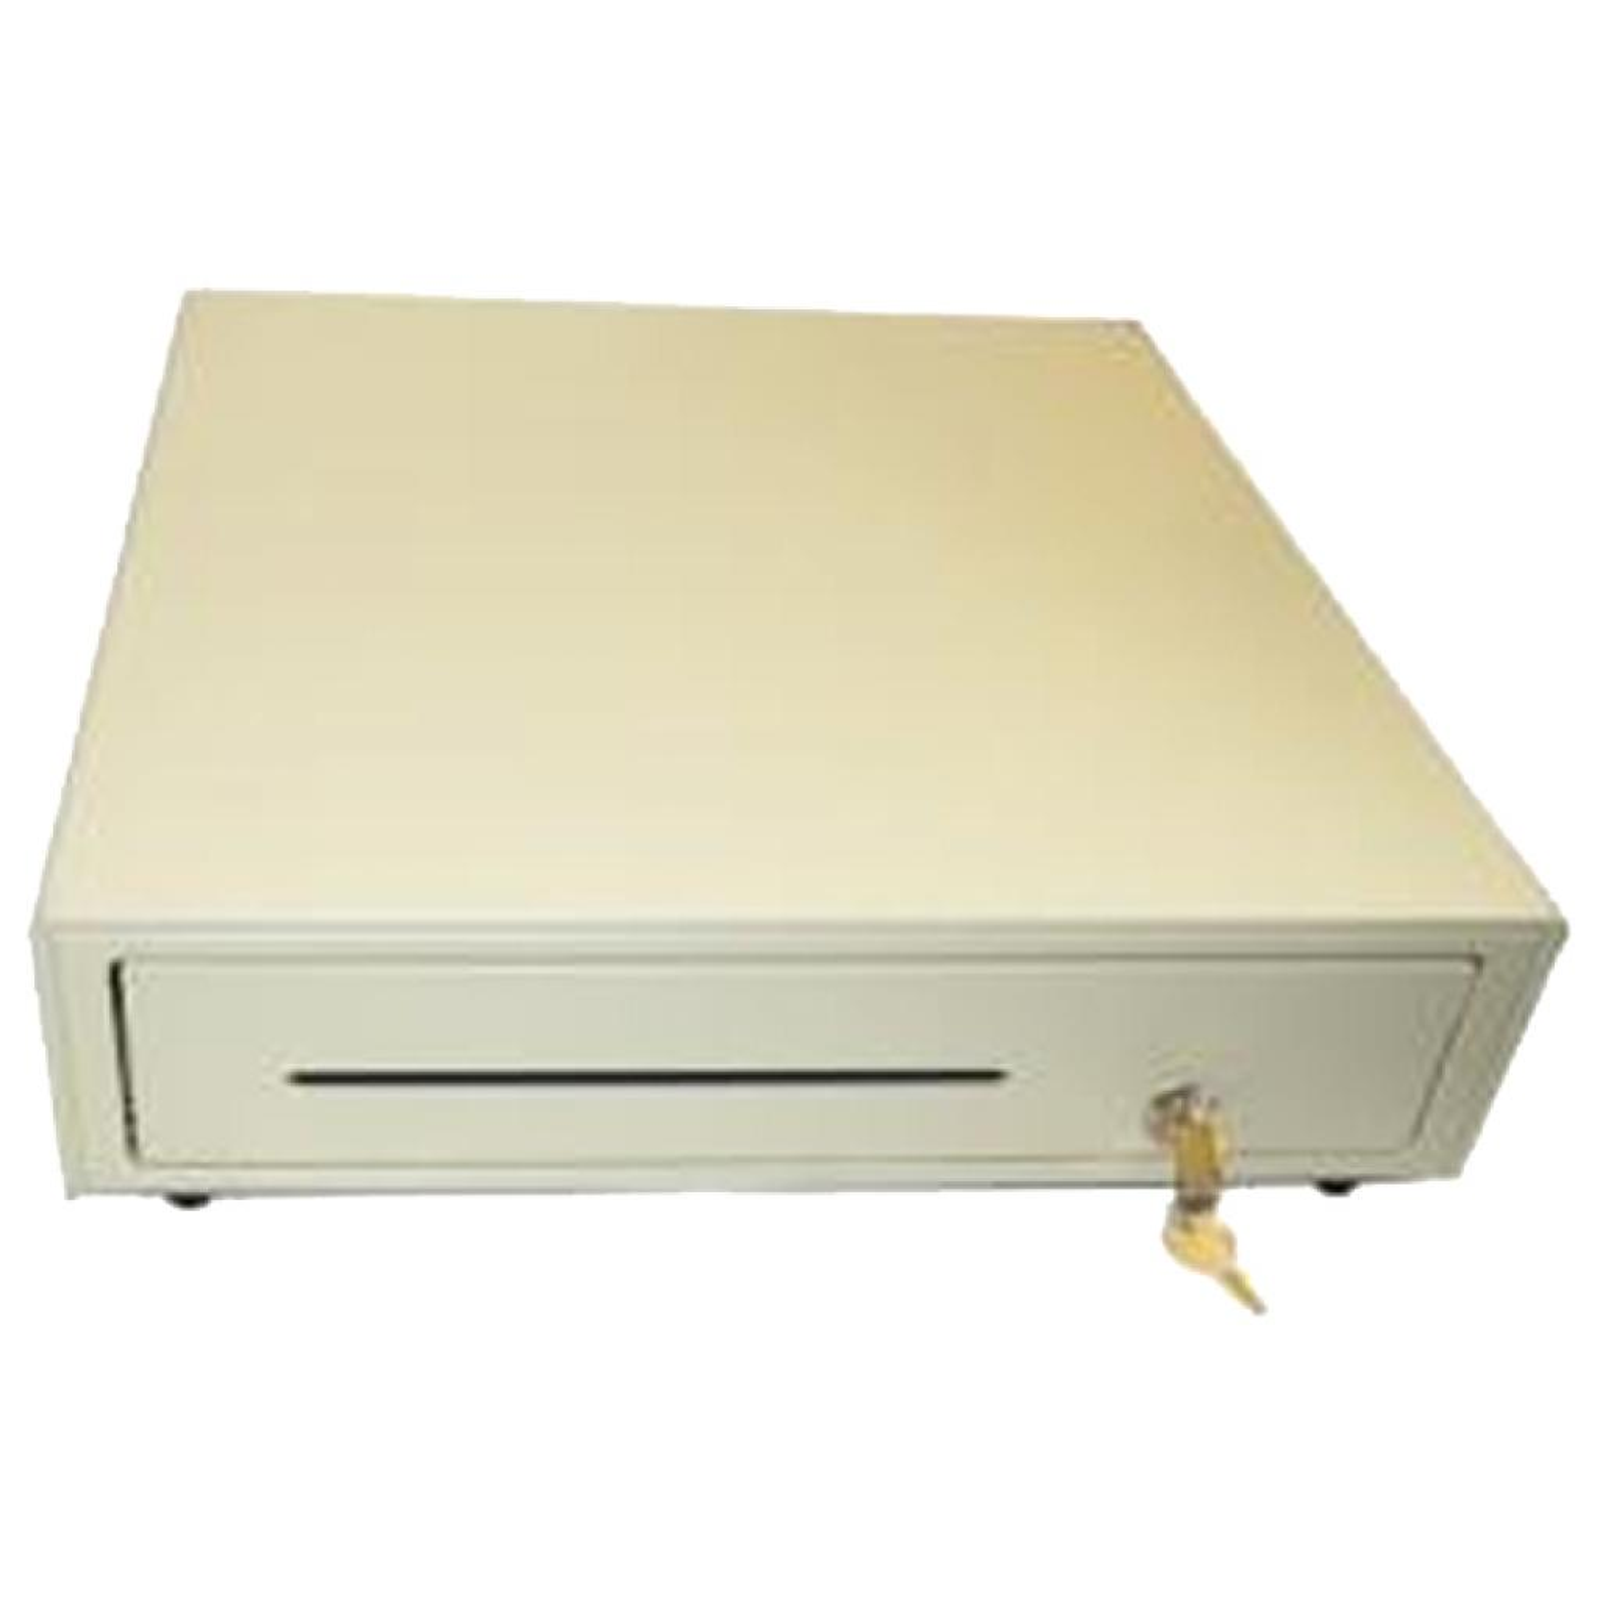 Денежный ящик ИКС-Маркет C4141A Ivory, 12V (C4141AIVORY12V)